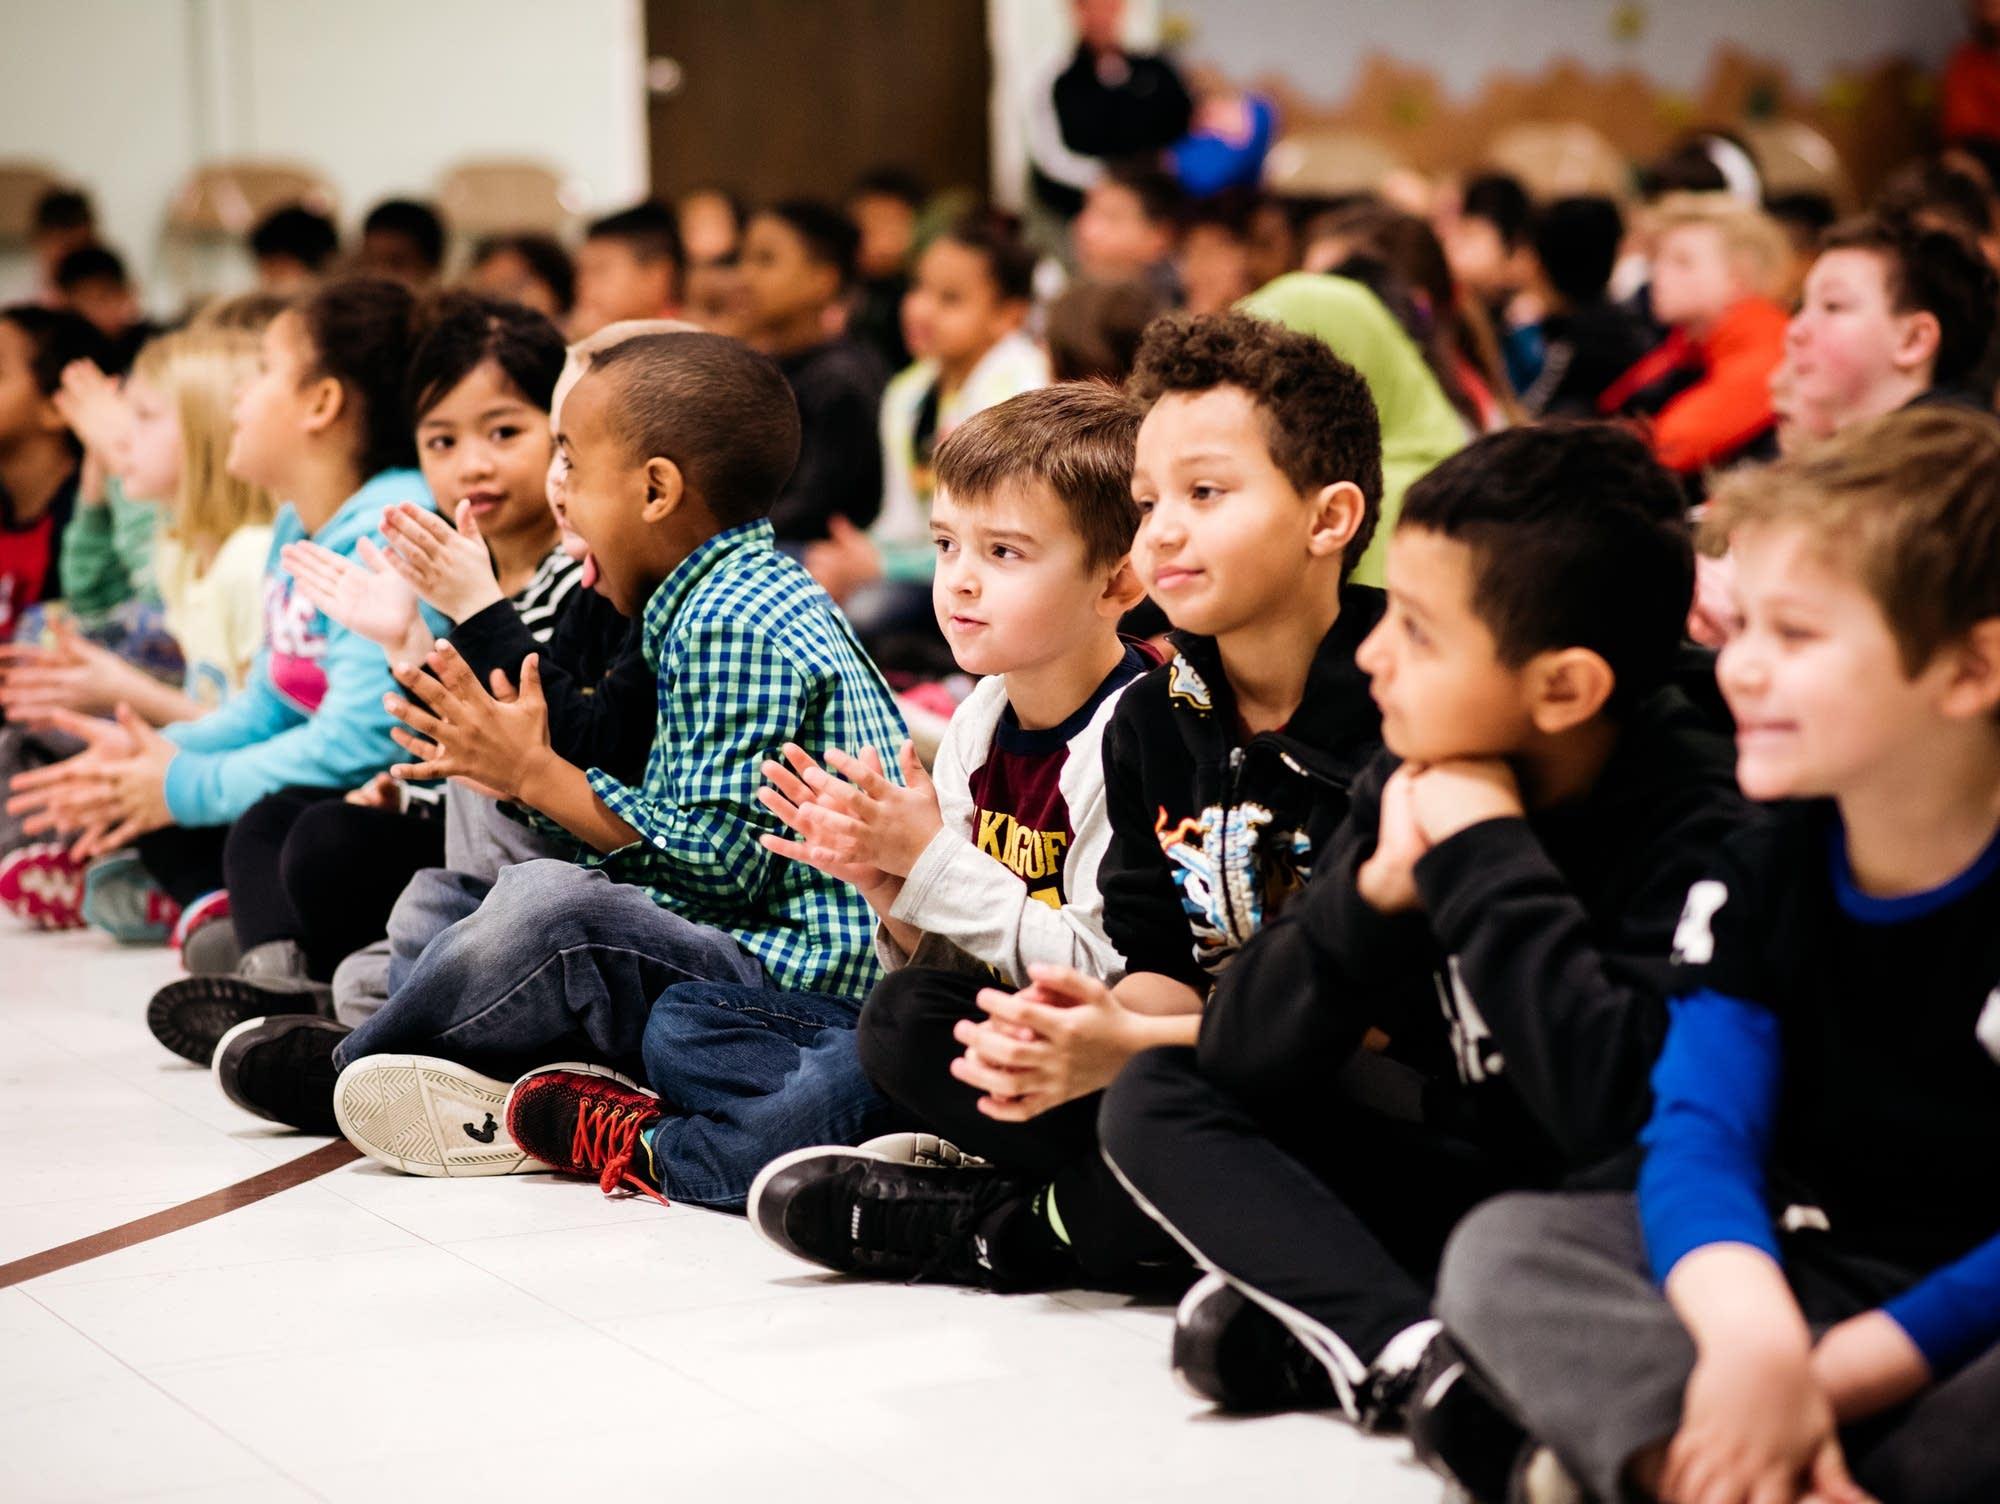 kids applauding cedarwood oak grove